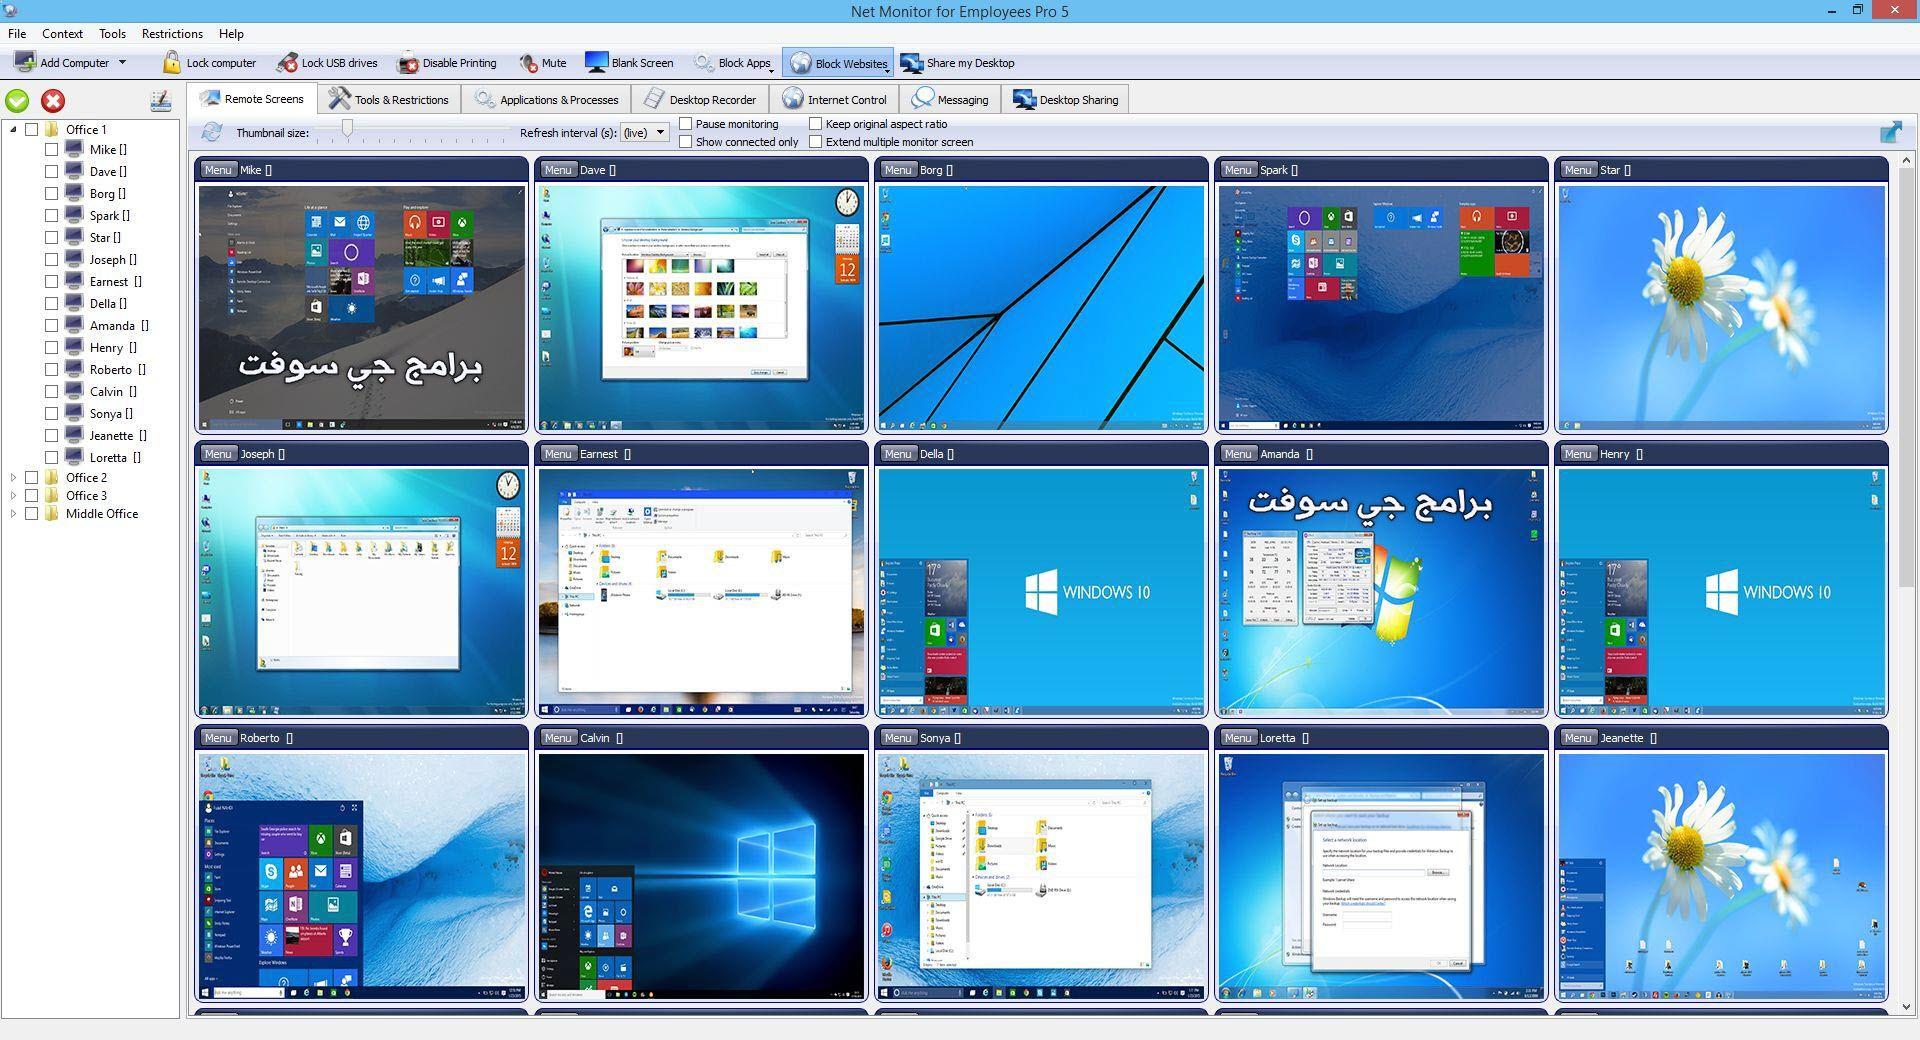 Net Monitor for Employees Pro برنامج مراقبة الاجهزة عن بعد